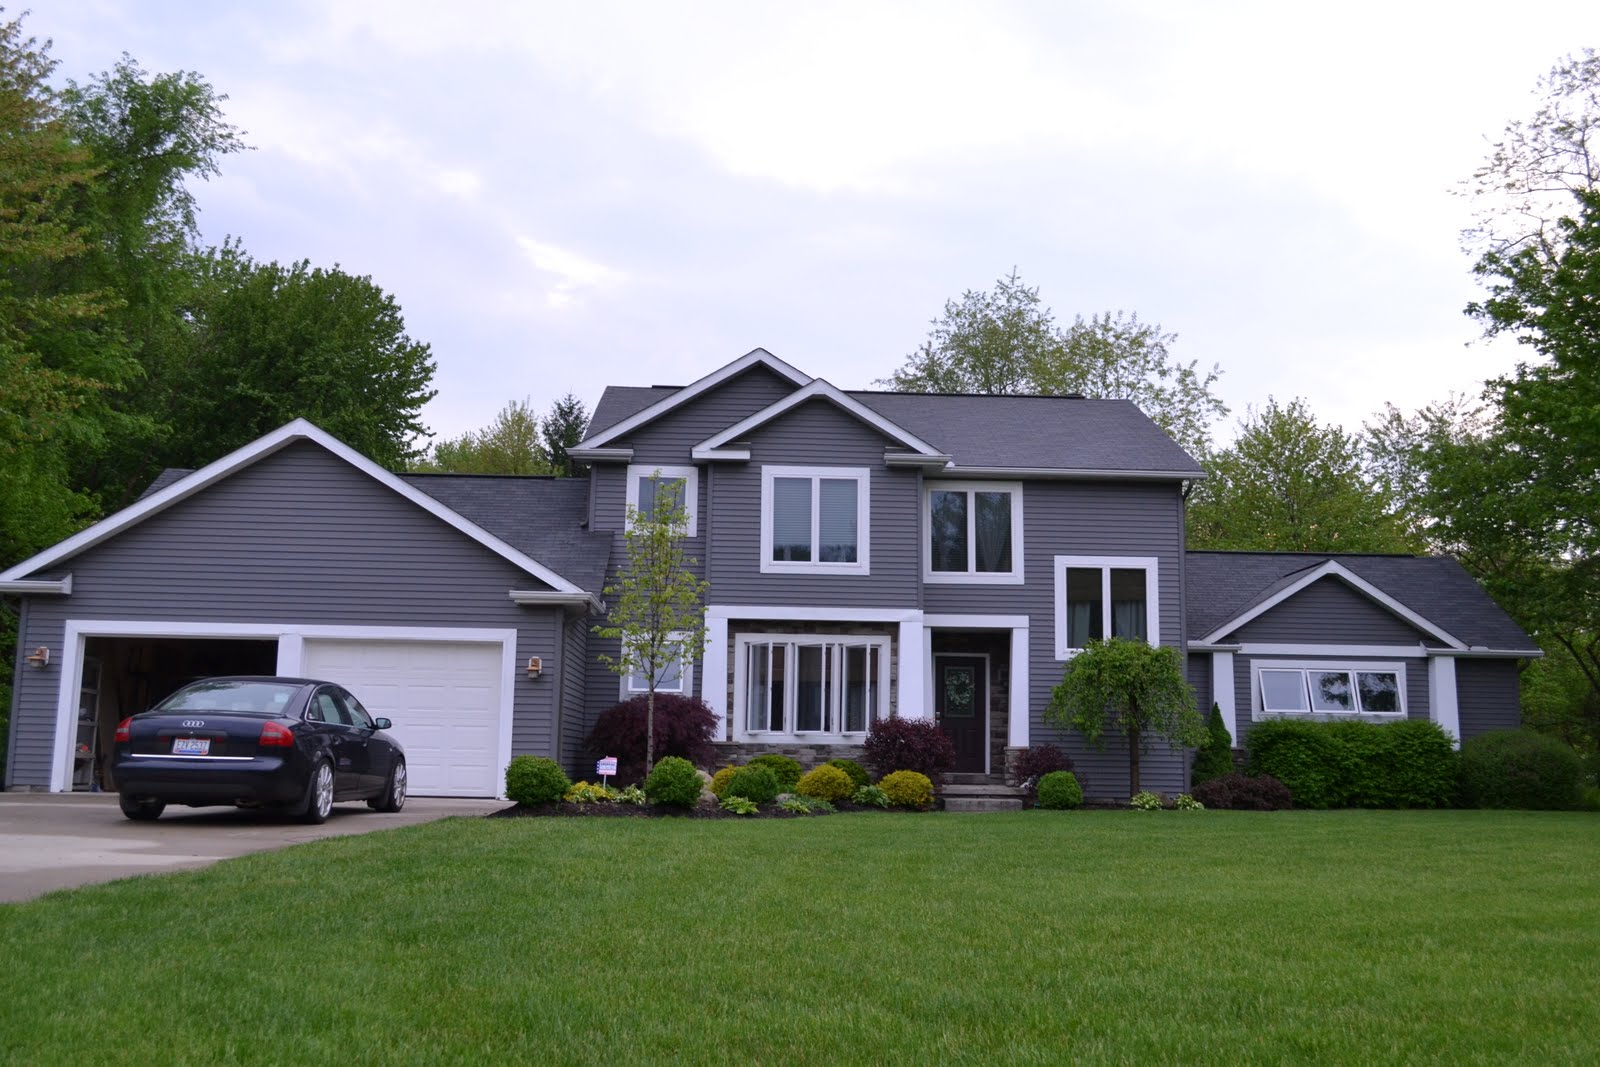 De jong dream house exterior - Exterior house colors with black trim ...